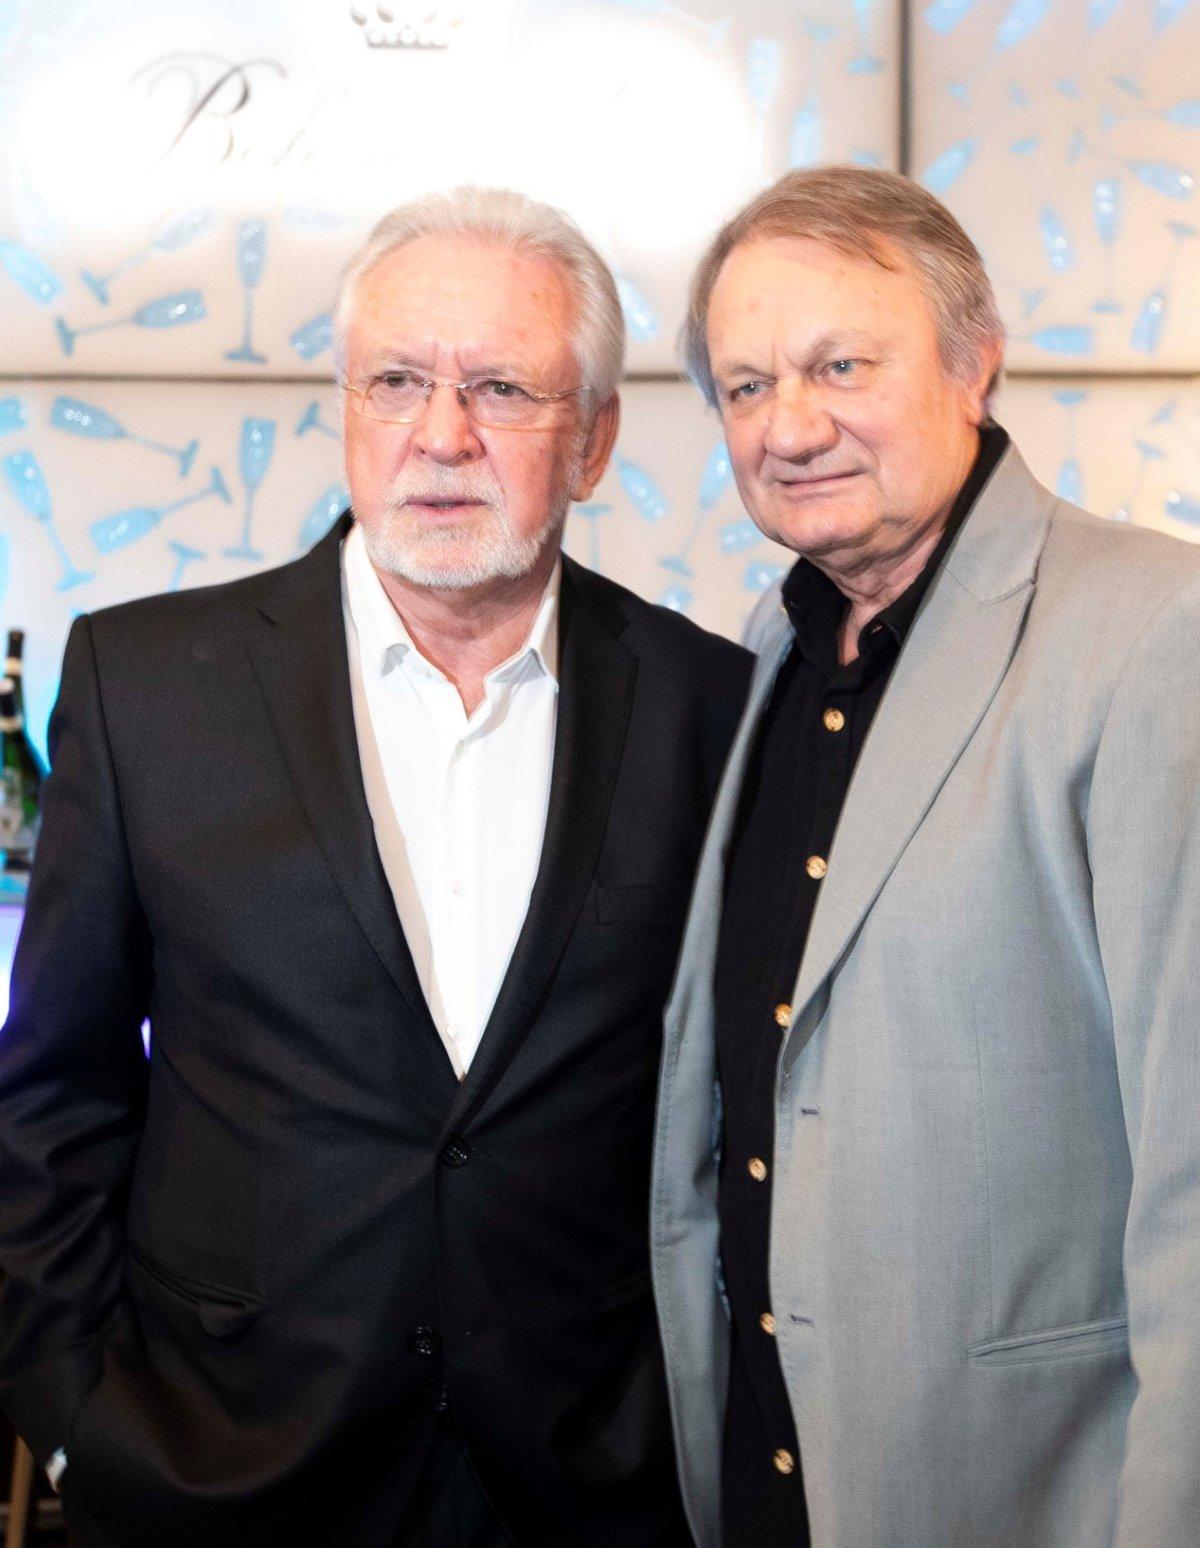 Premiéra Léta s gentlemanem: Jaromír Hanzlík a Jiří Adamec